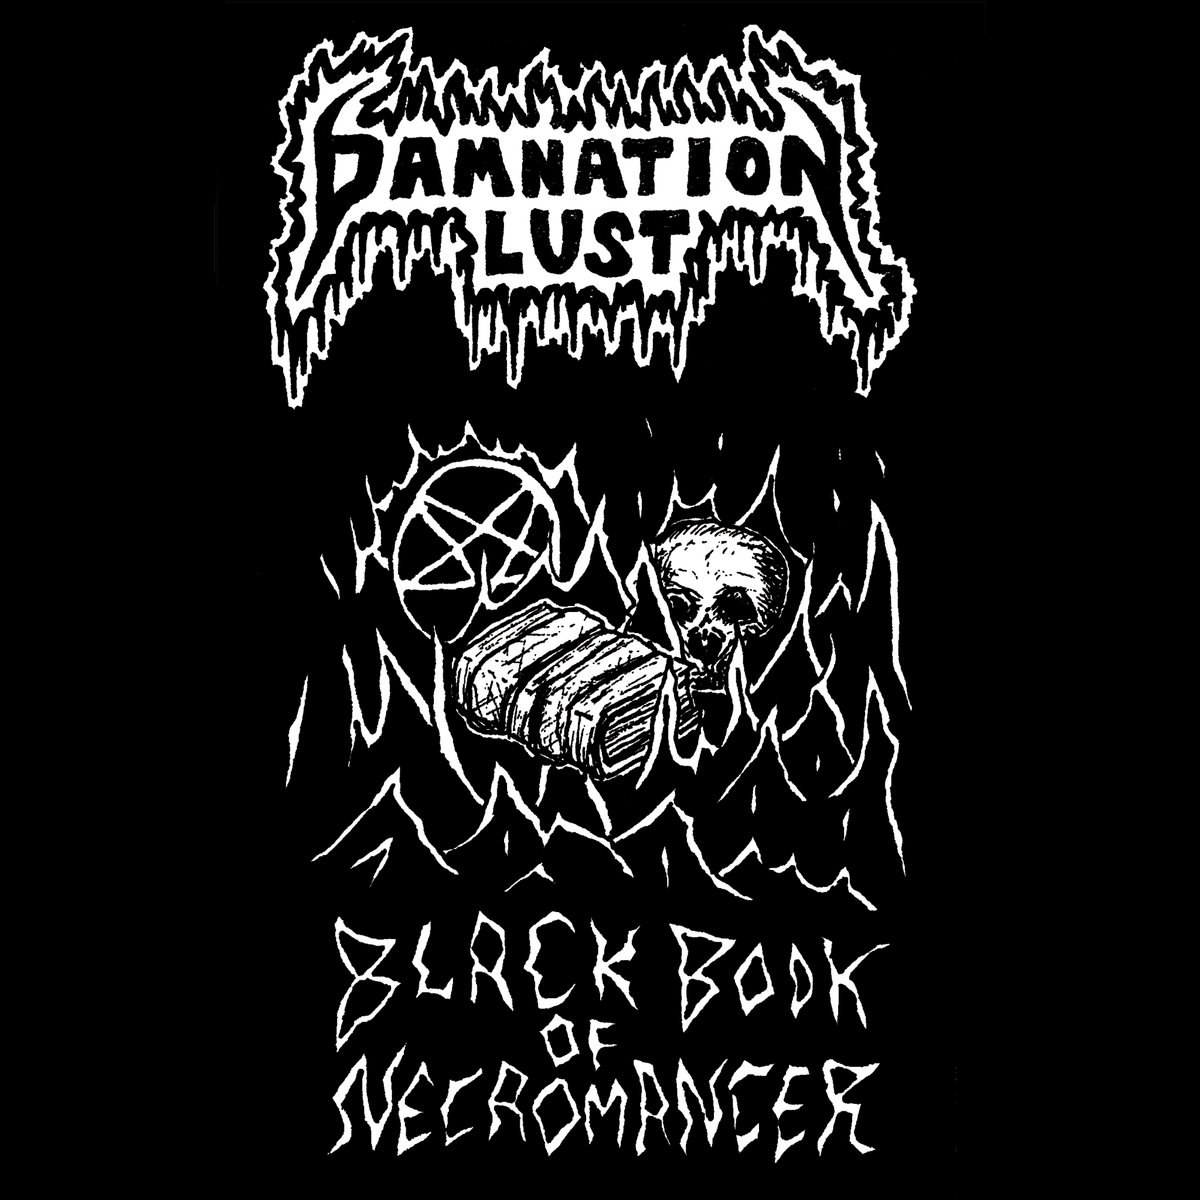 Damnation Lust - Black Book of Necromancer